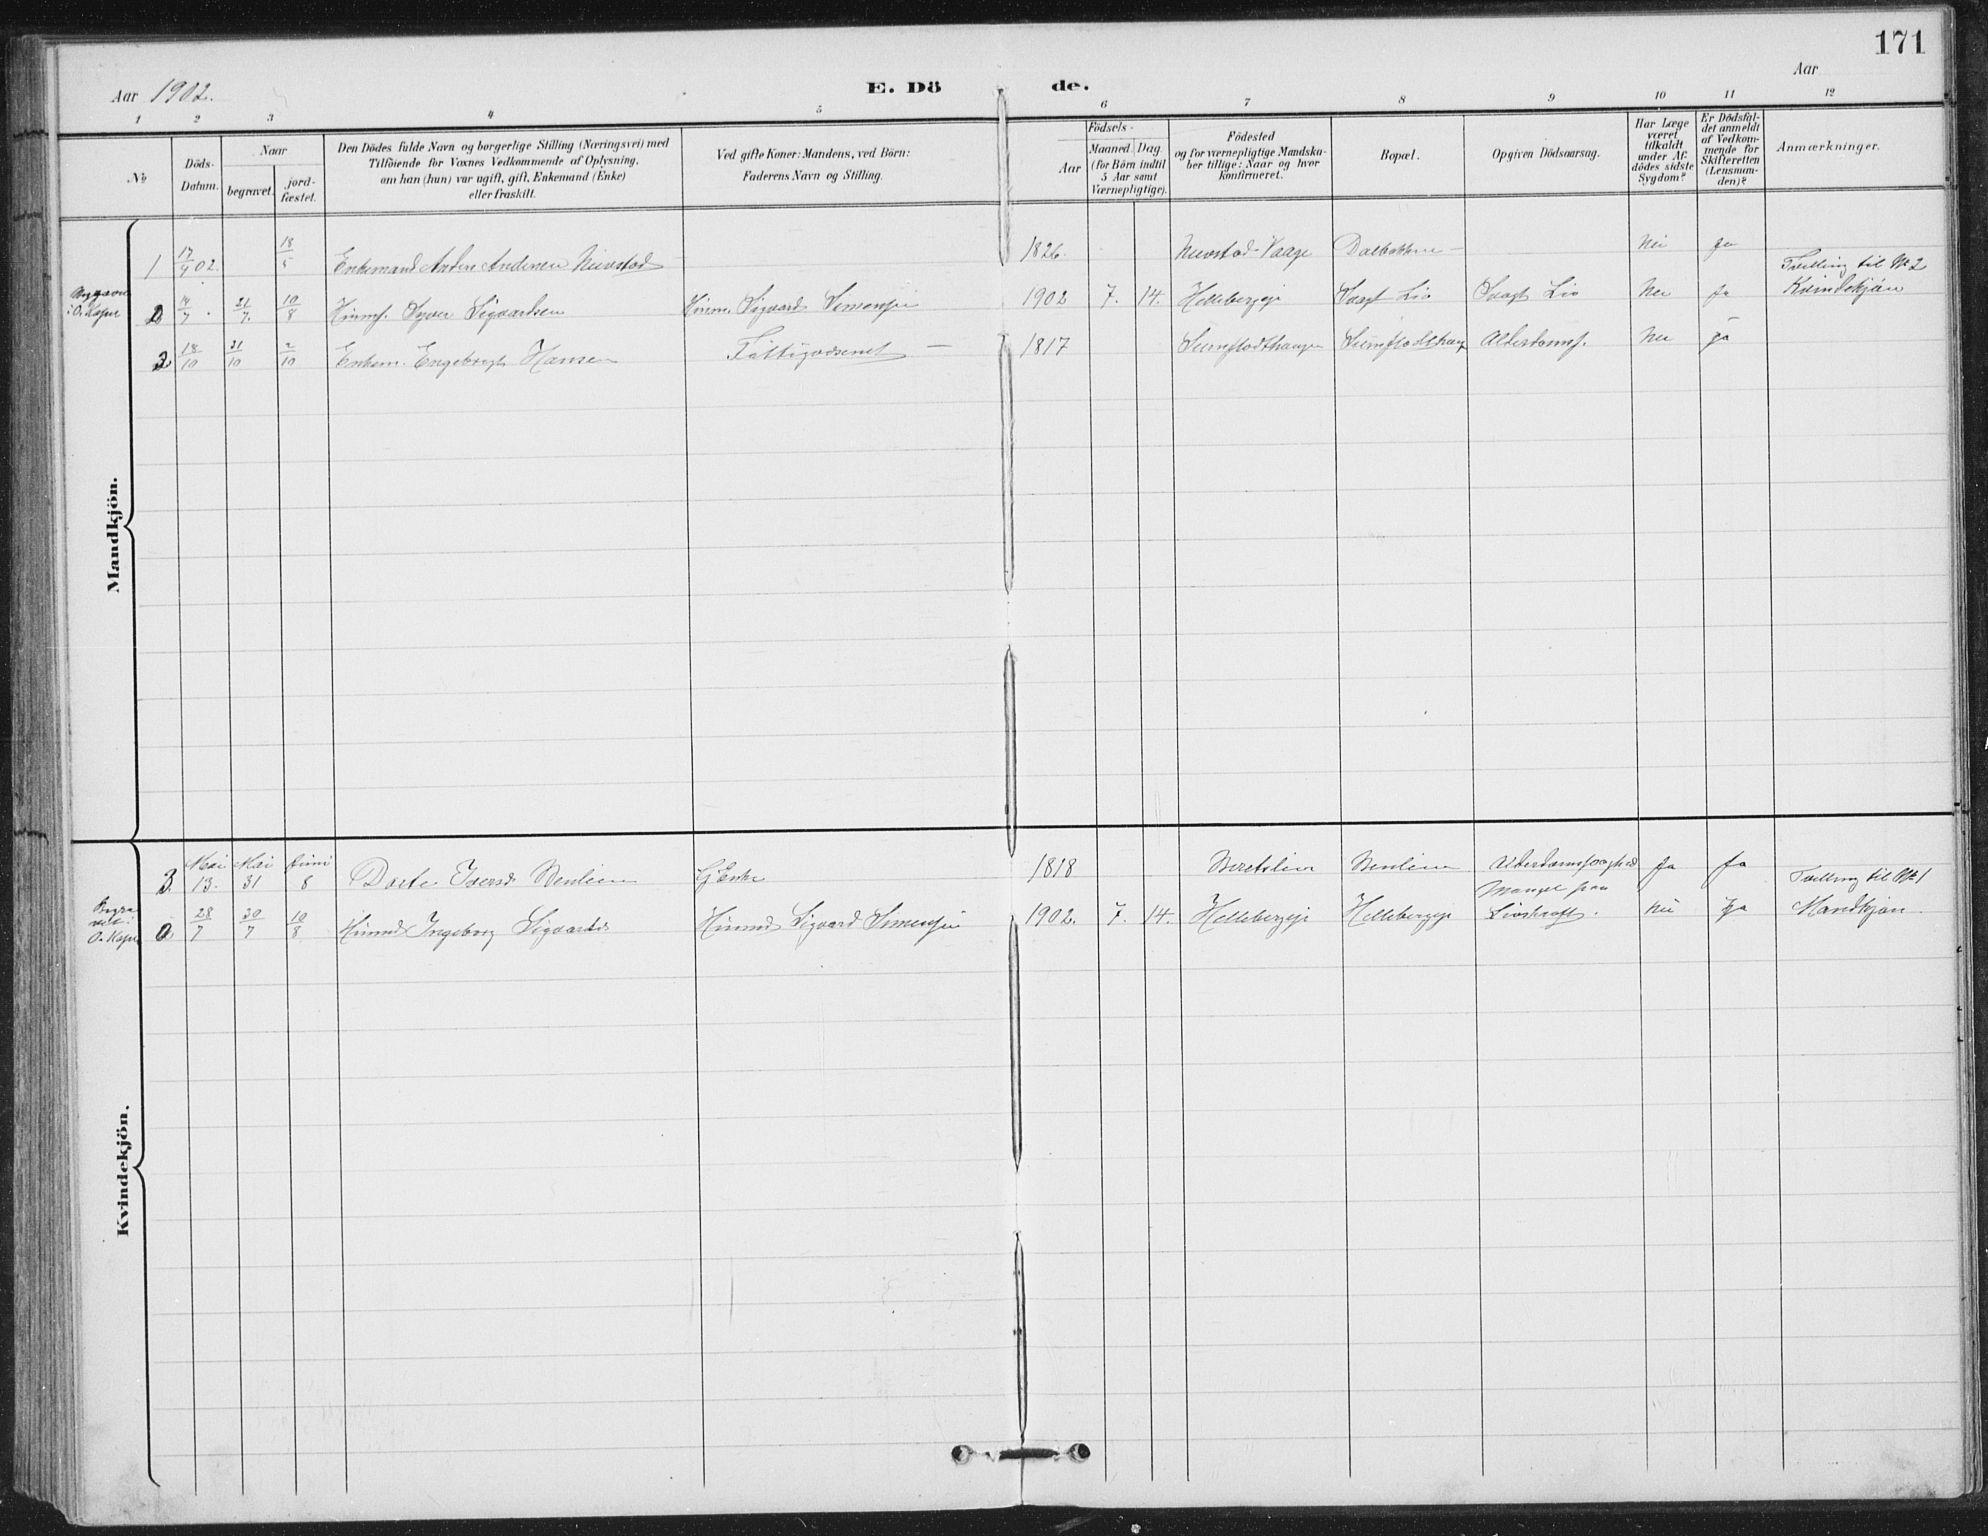 SAH, Vestre Gausdal prestekontor, Klokkerbok nr. 4, 1898-1939, s. 171